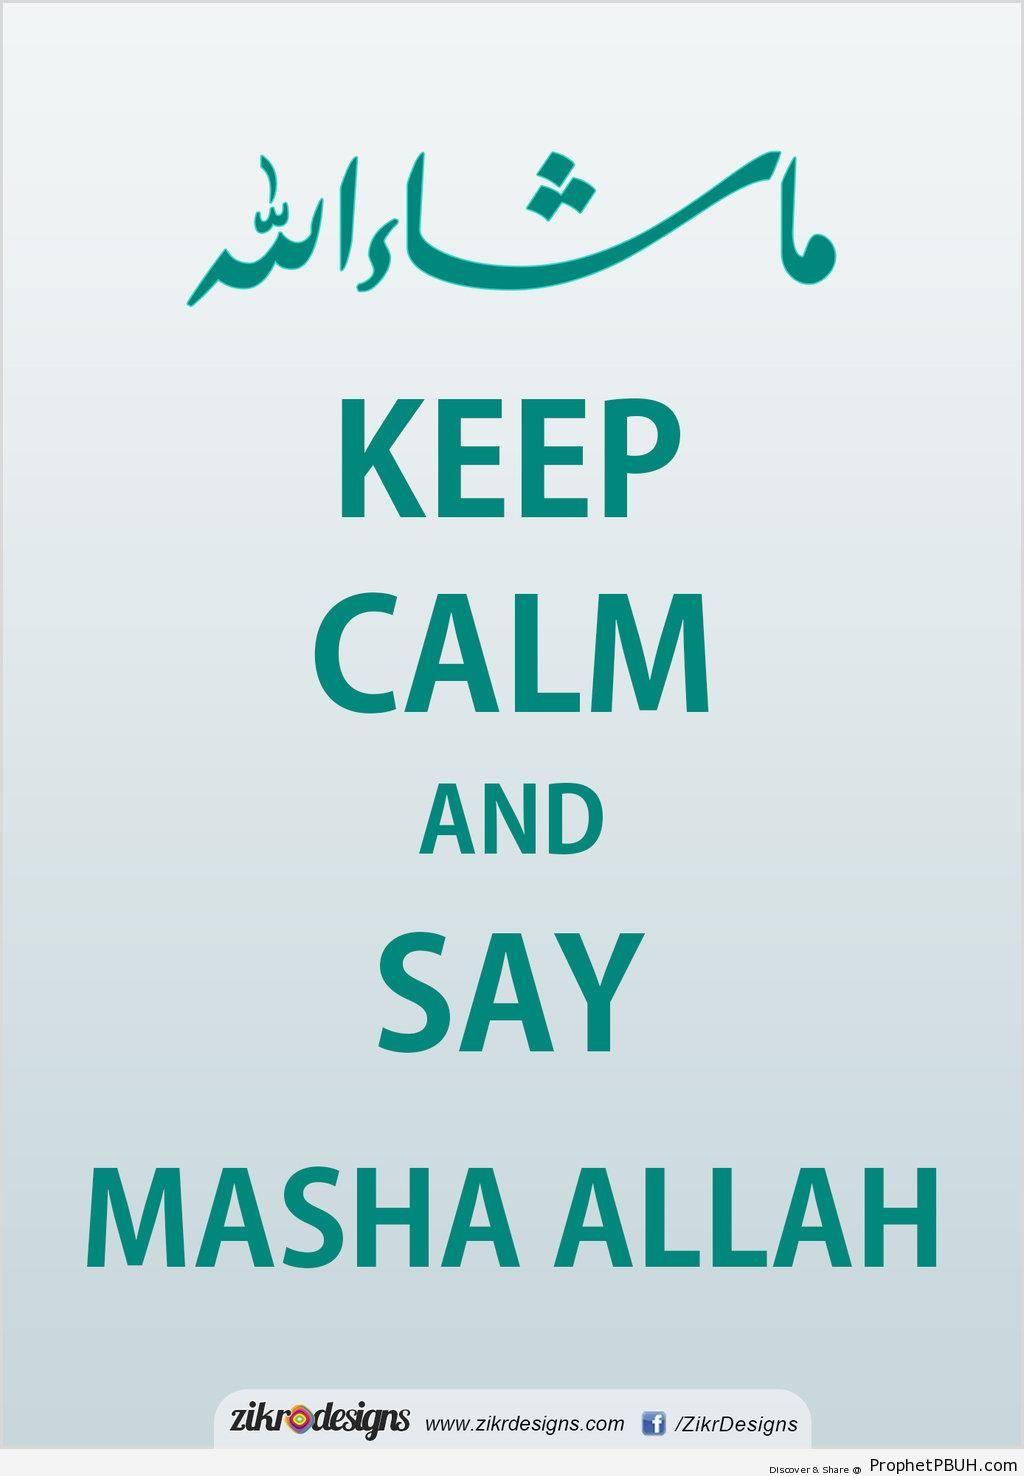 Keep Calm and Say Masha Allah - -Keep Calm and...- Posters